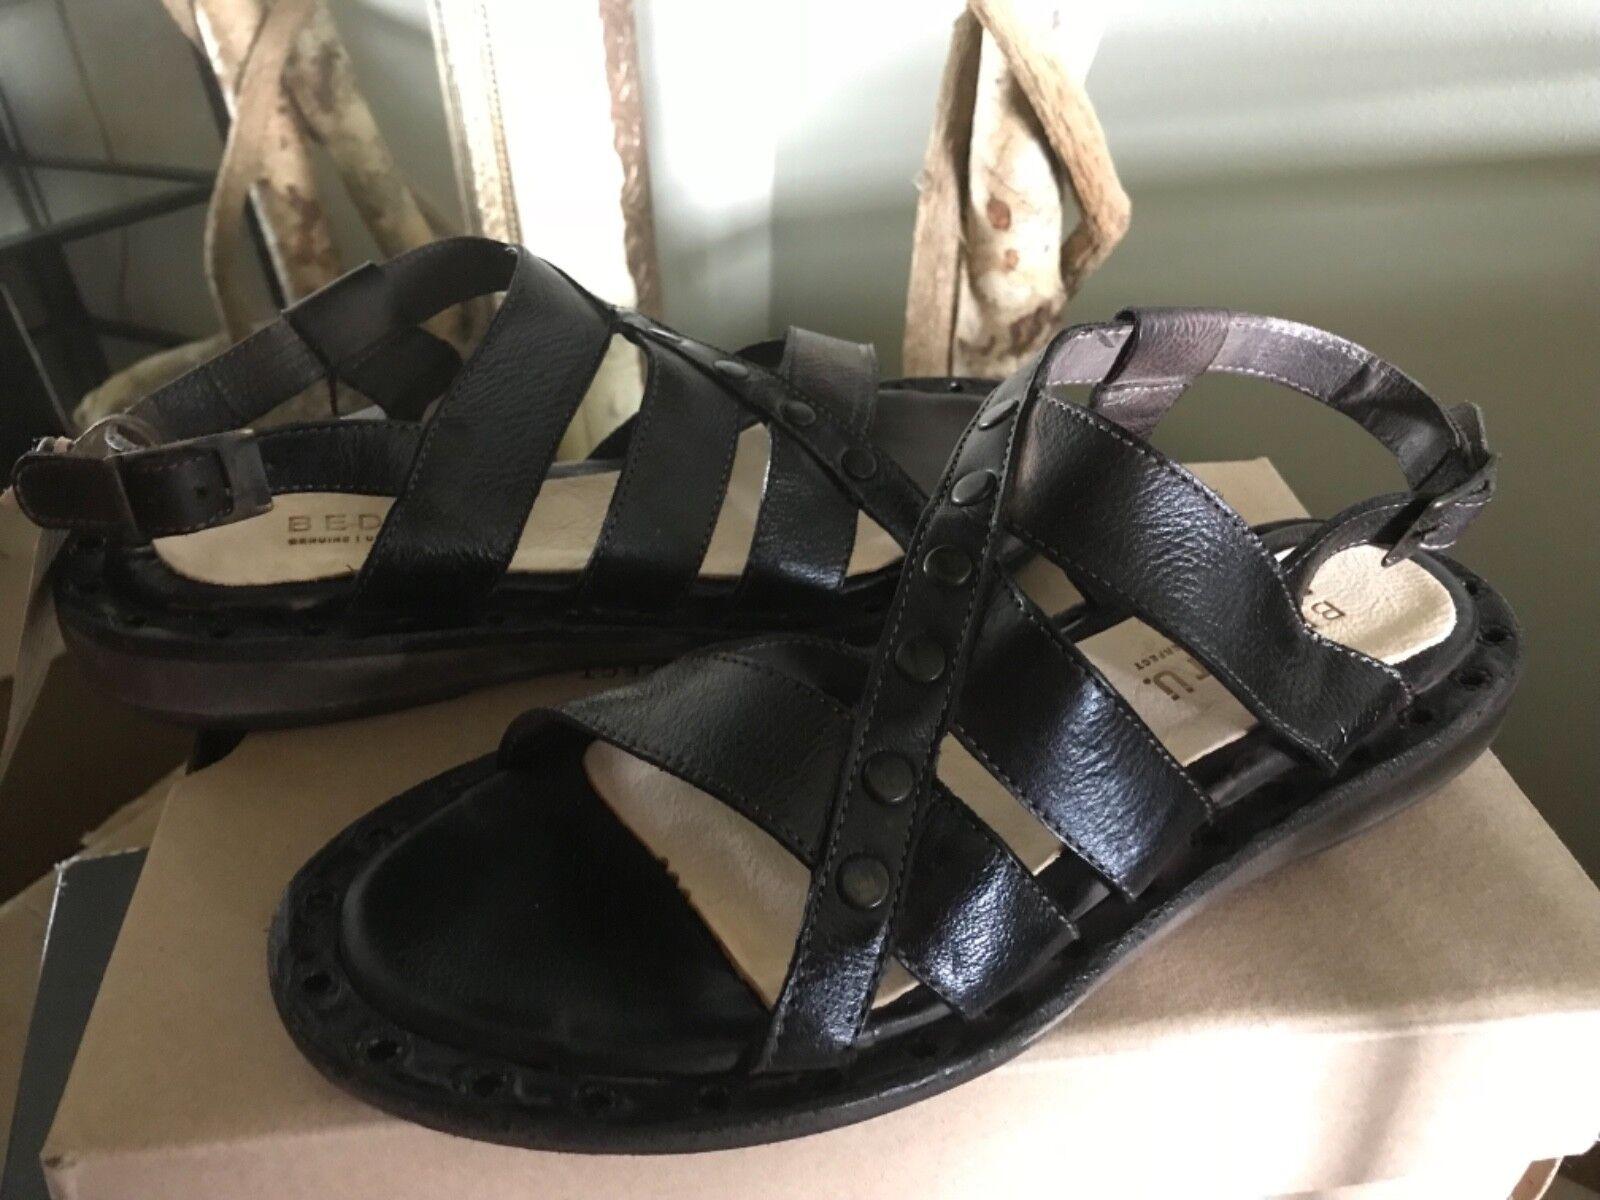 BED STU Kavala donna  Teak Leather Sandals 7M MSRP  159  negozio online